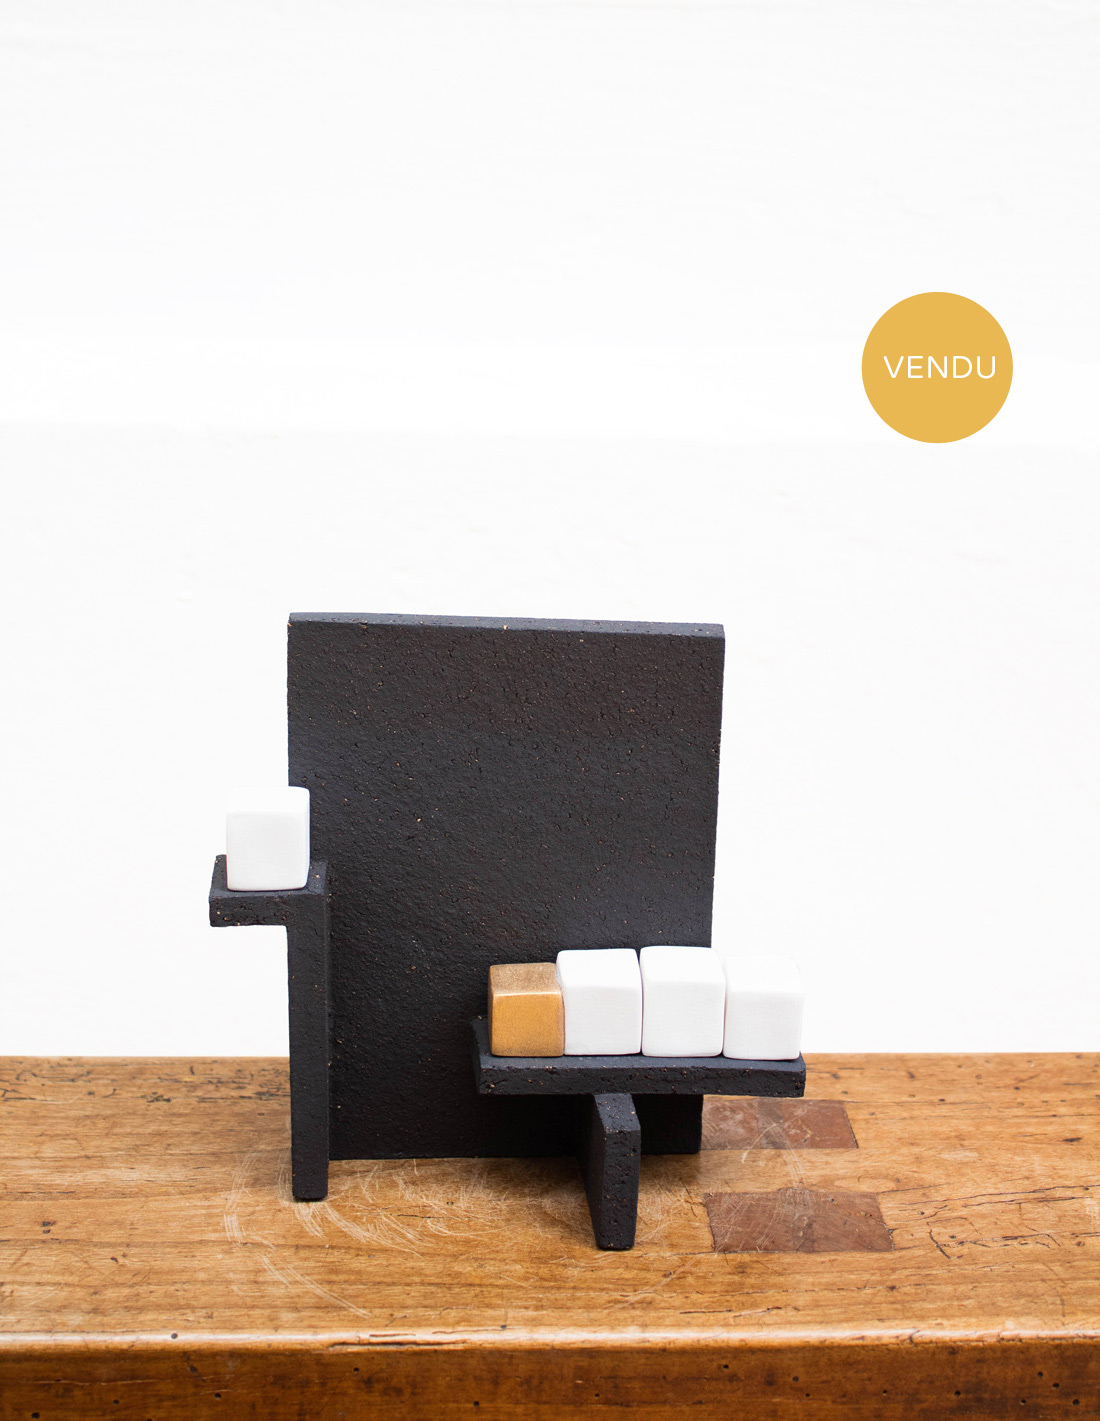 collection-cube-5-1-vendu